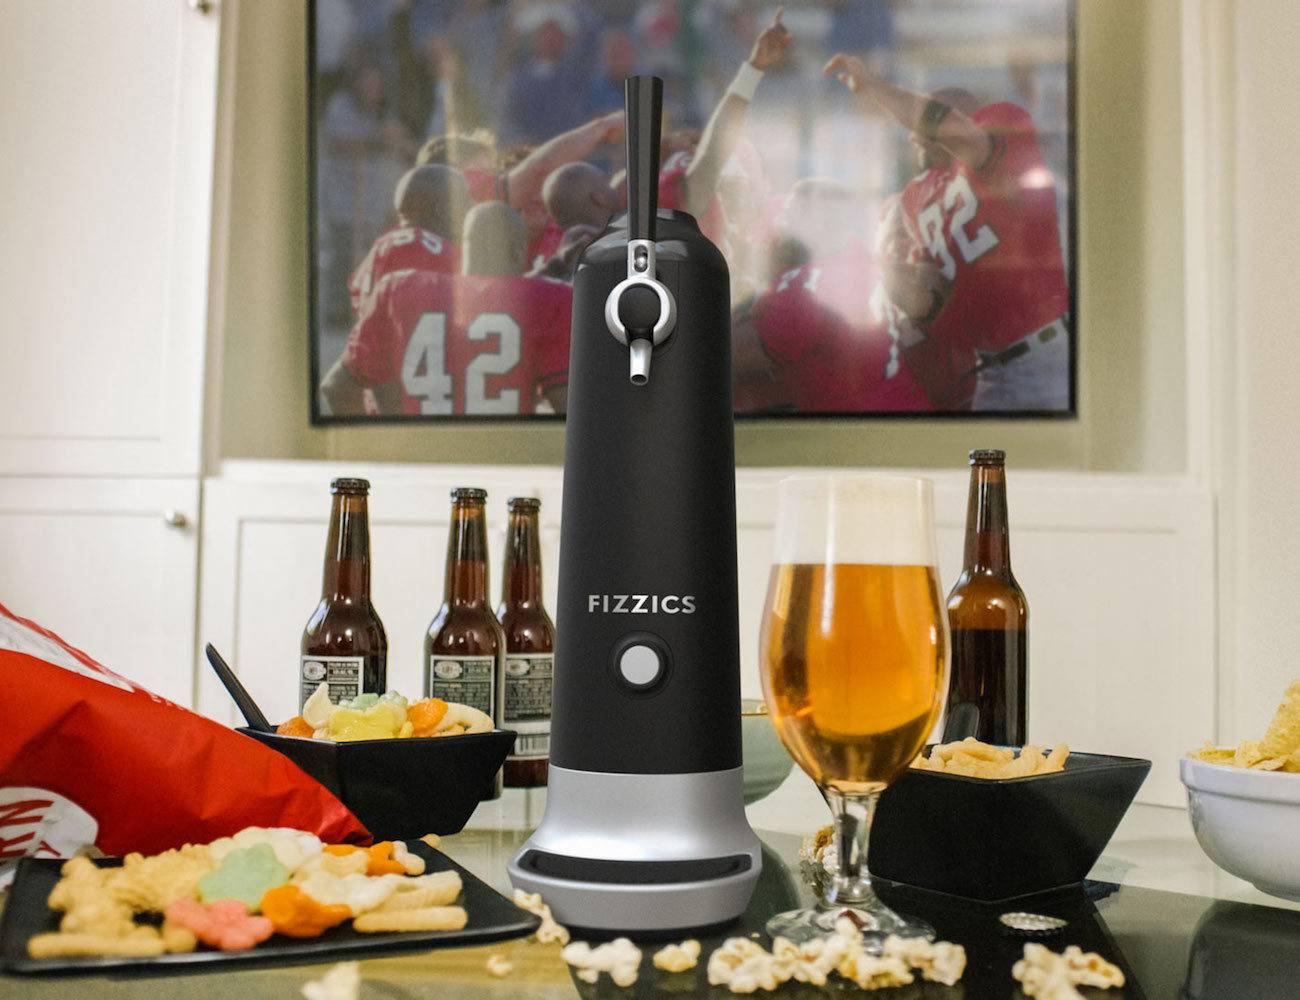 Fizzics Waytap Draft Beer System